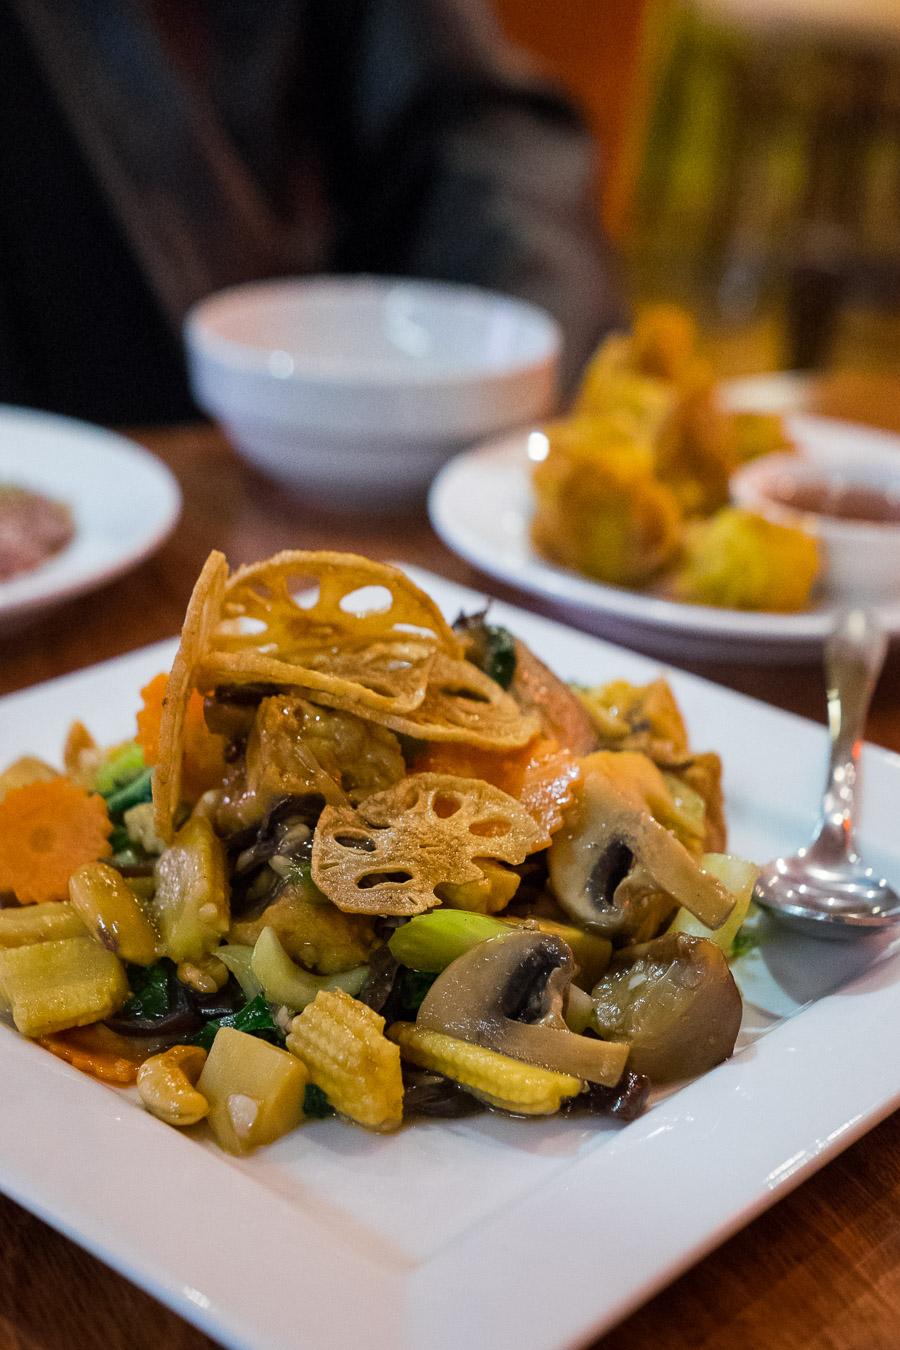 Buddha's Garden (AU$14.00) - tofu, bamboo shoots, baby corn,  wood-ear fungus and cashew nuts.